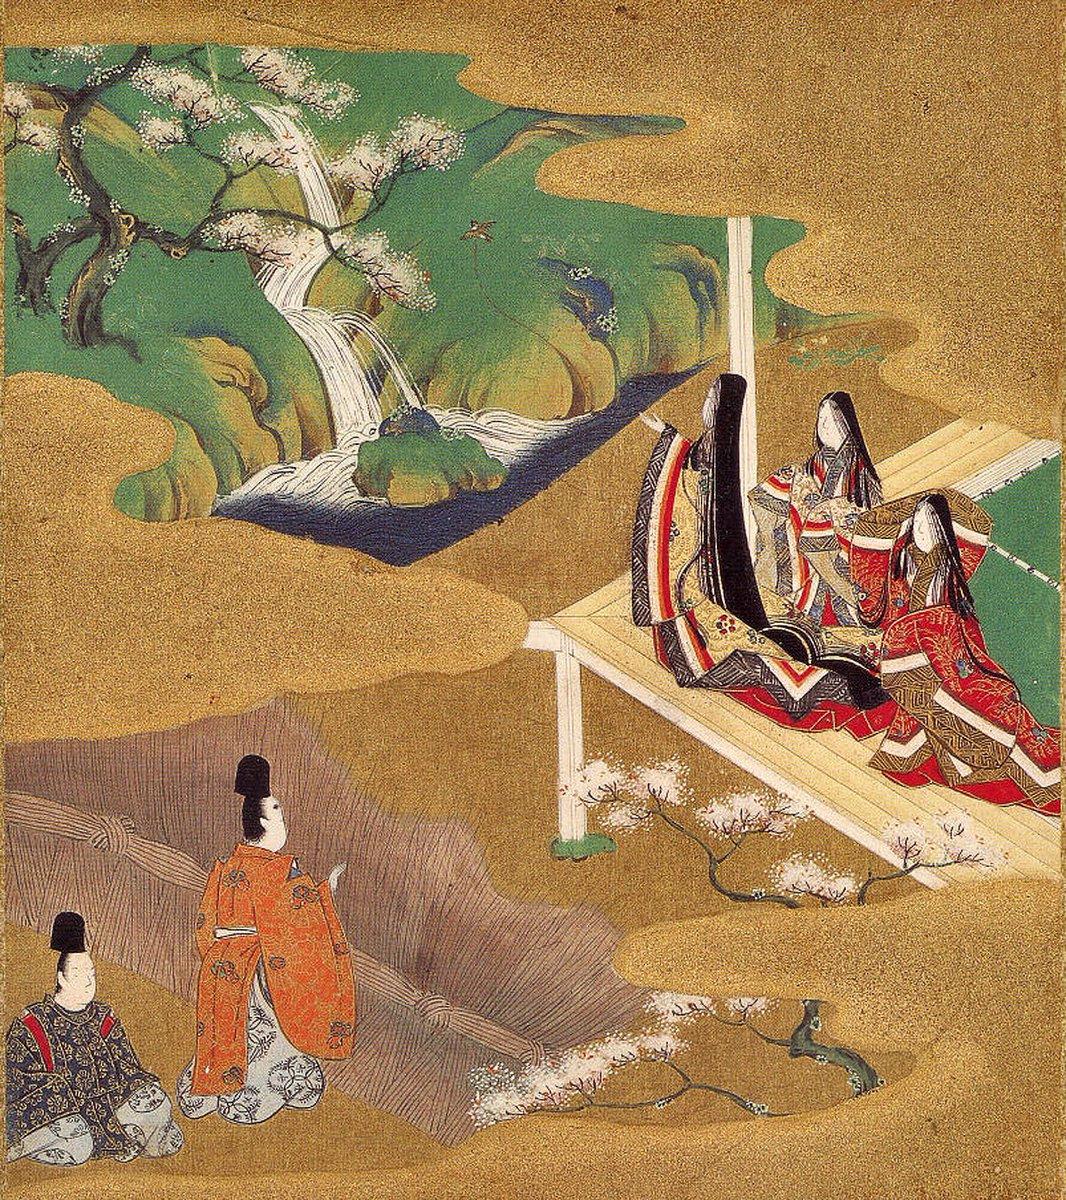 JAPAN ART  ⛩ - Page 5 DUKP2-5UMAAVwxt